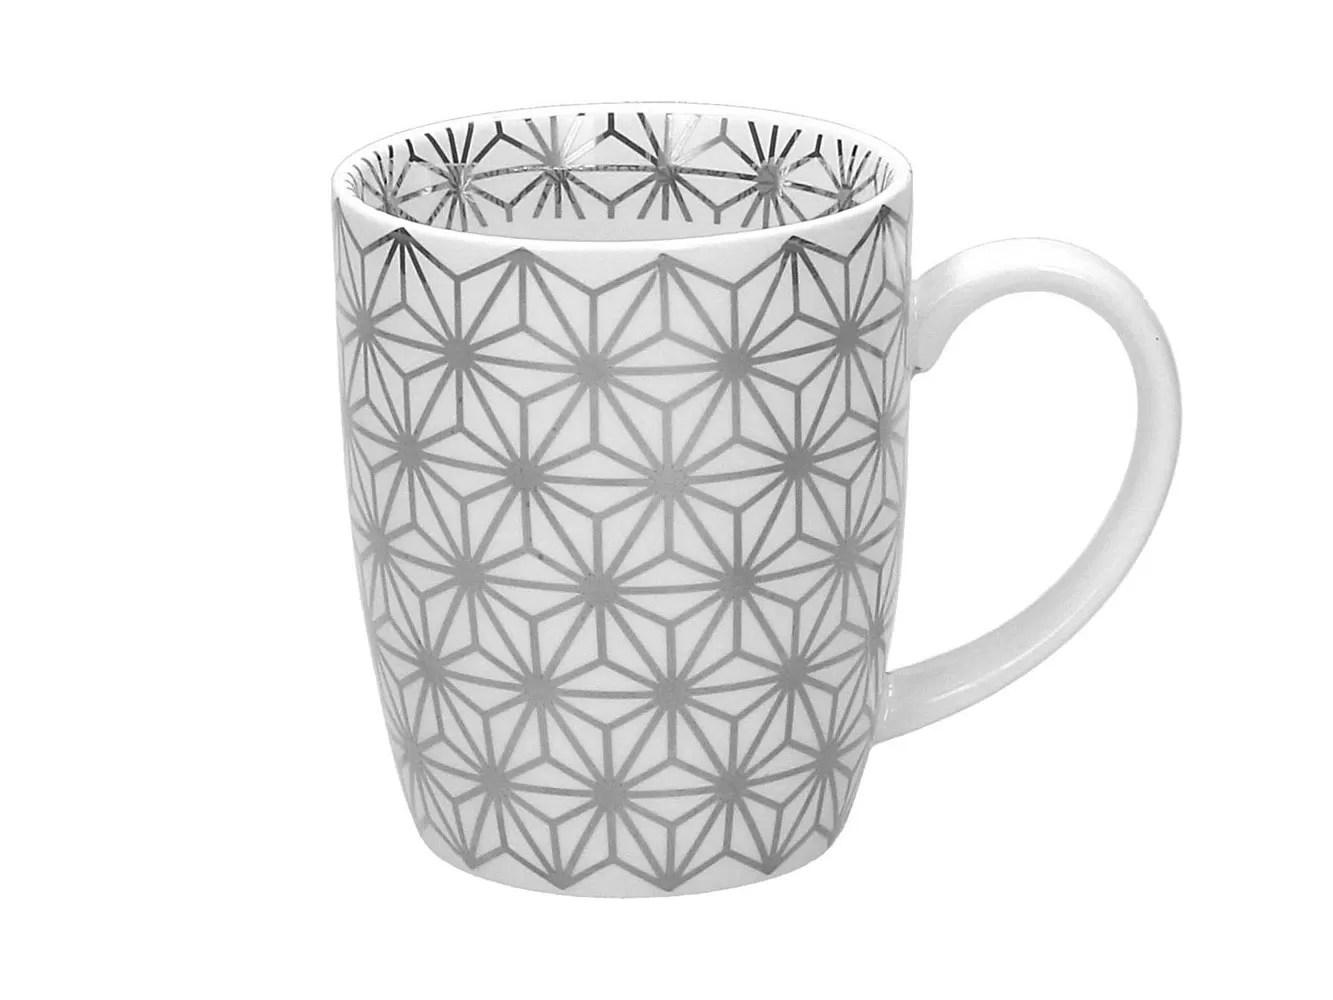 regali per amanti del tè - tazza tognana